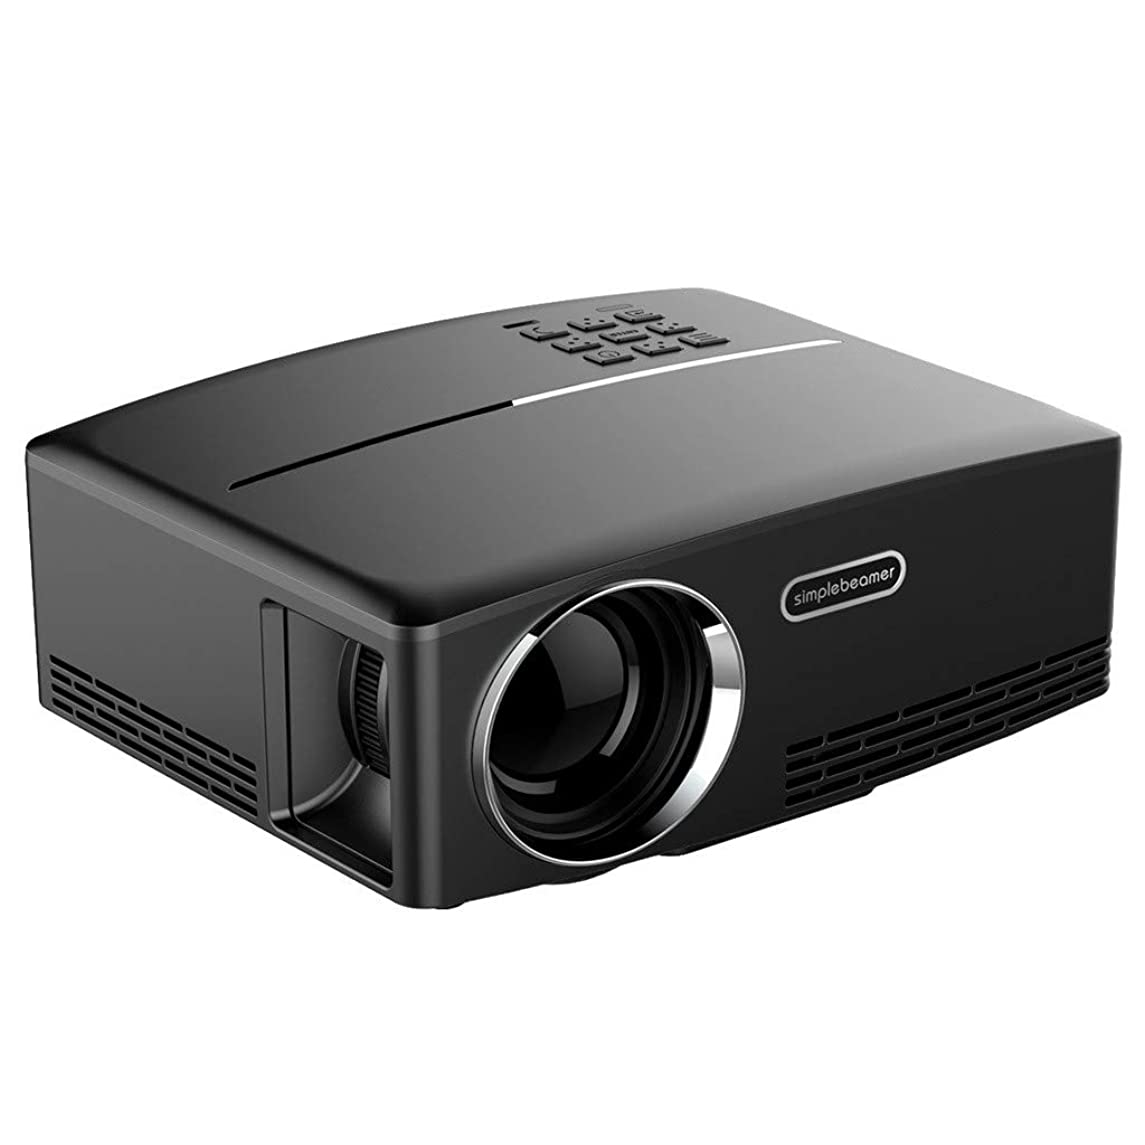 GP80 LED Projector - 1800 lumens 1080P Full HD Mini Portable Home Entertainment Projector, Movie Projectors, Brightness Video Projector, Home Entertainment (? Black)